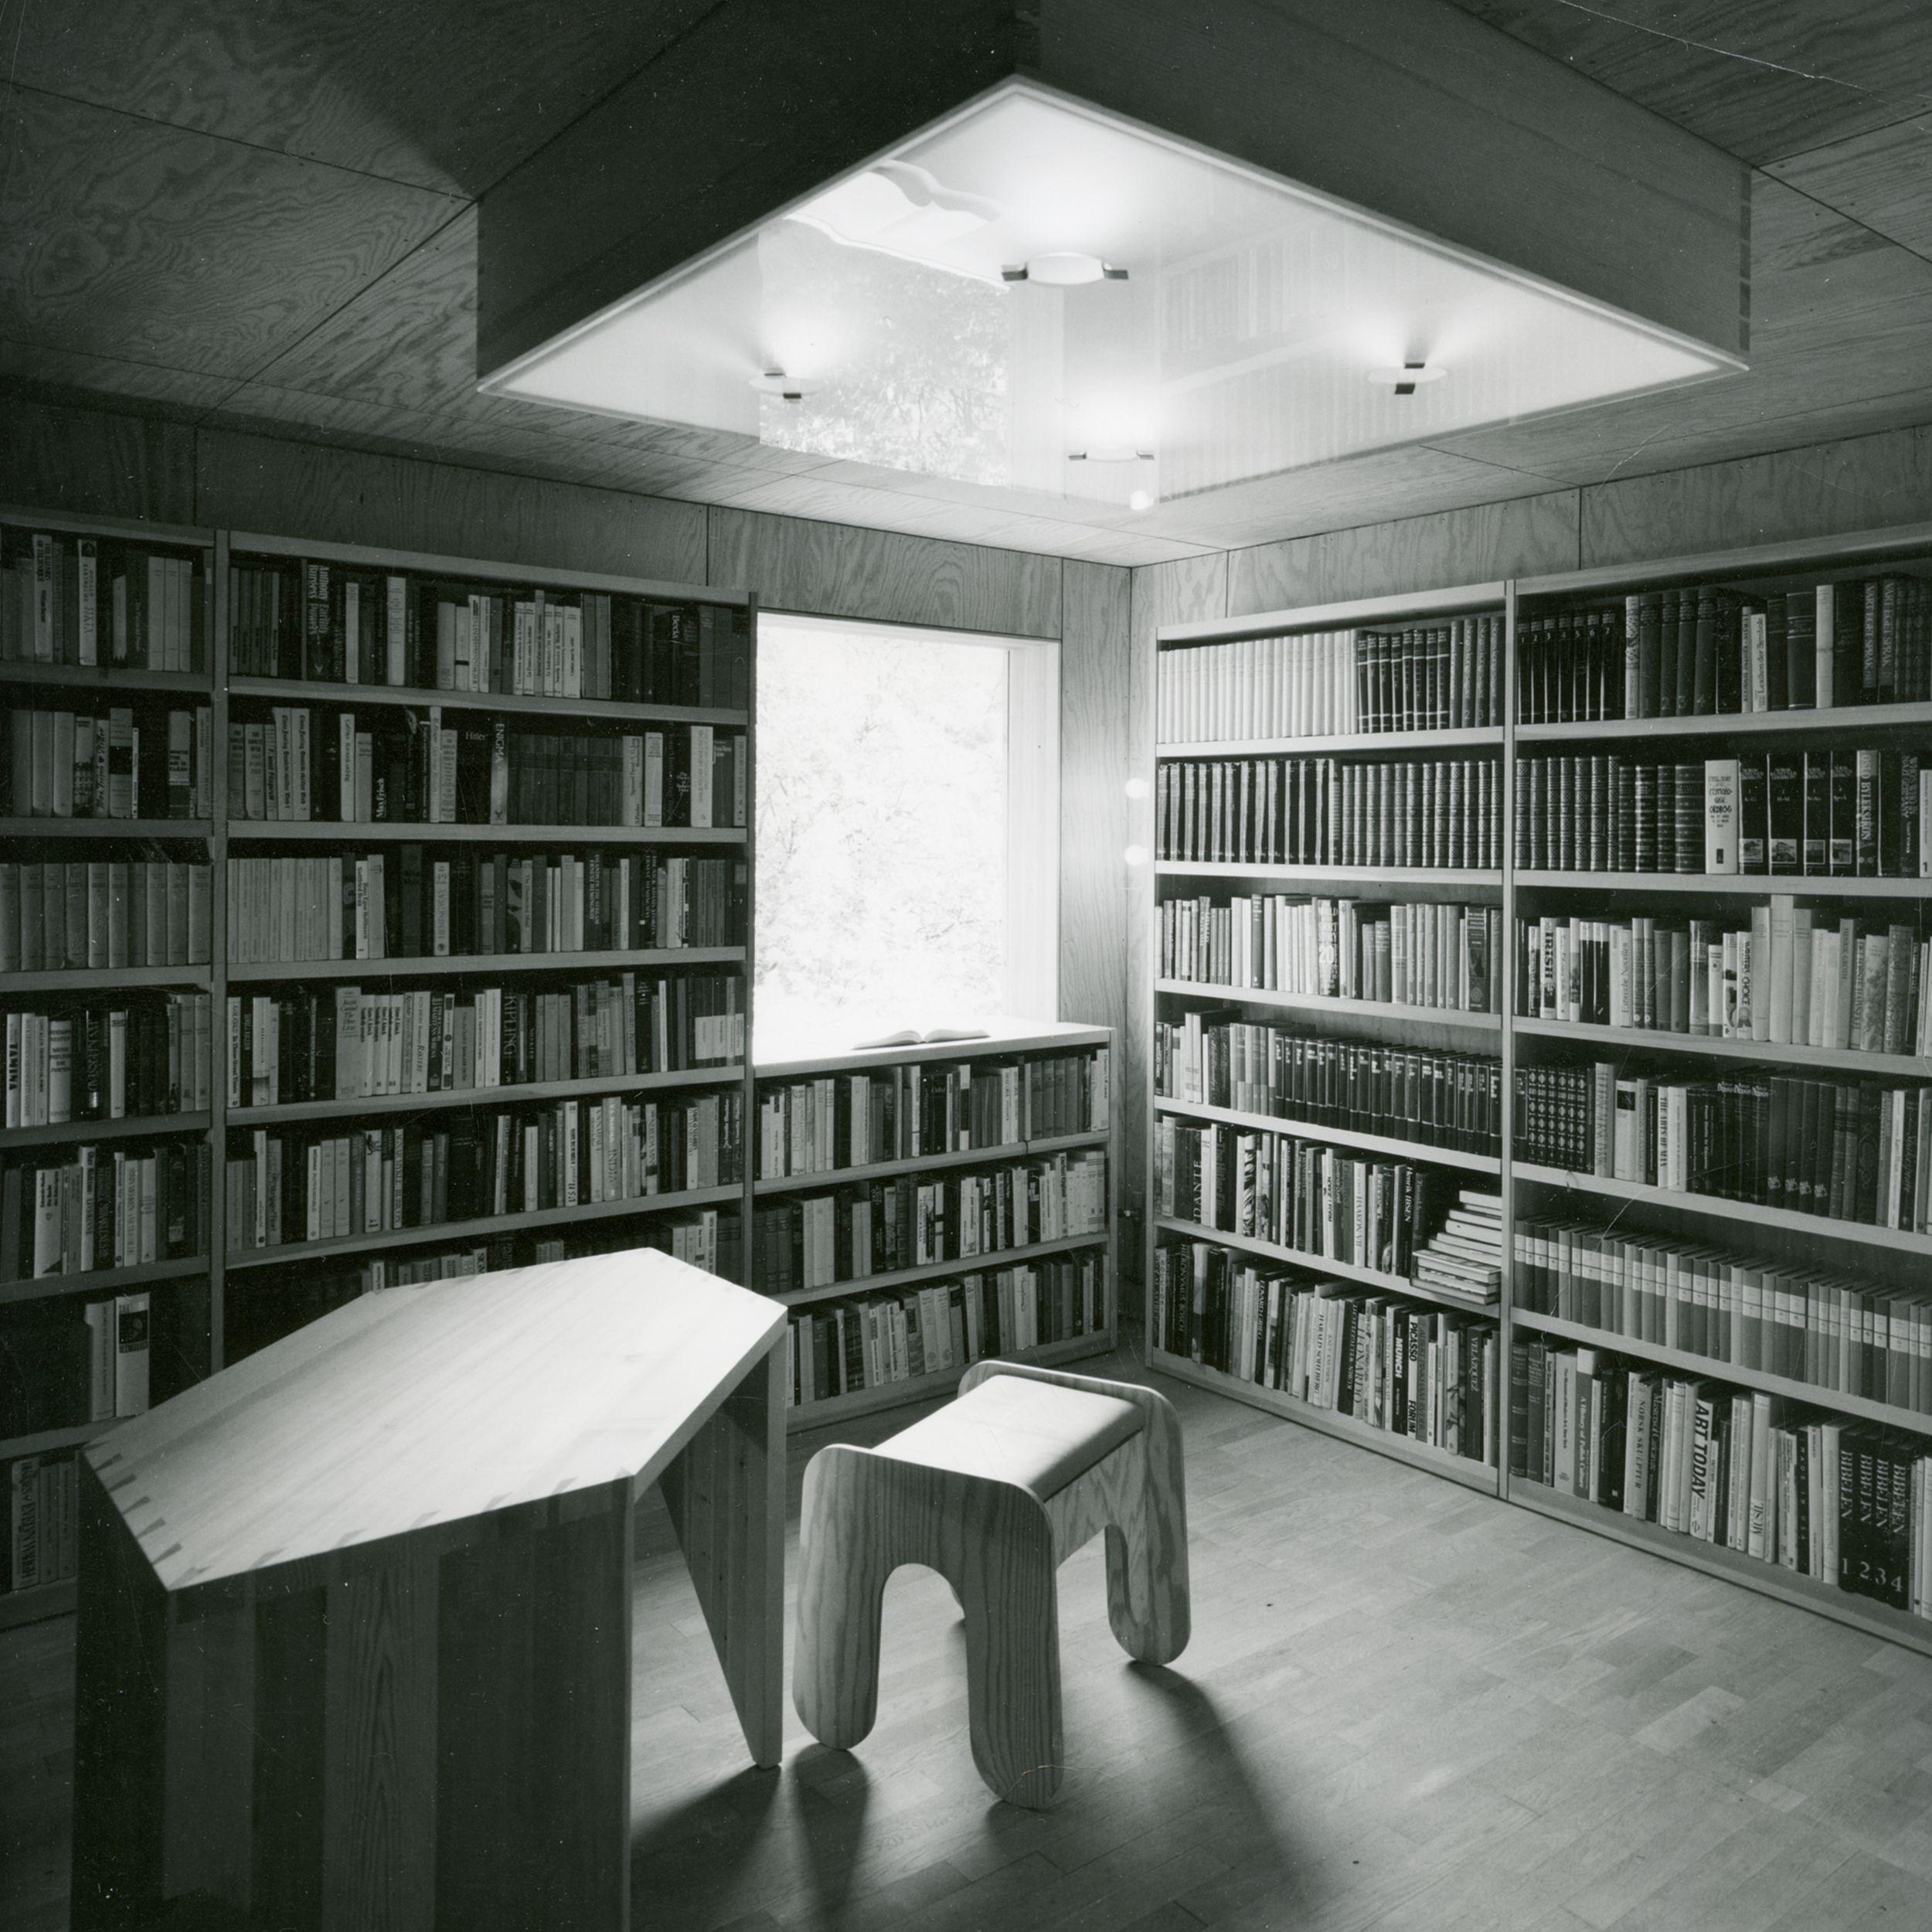 Bibliotek - Gion A. Caminada